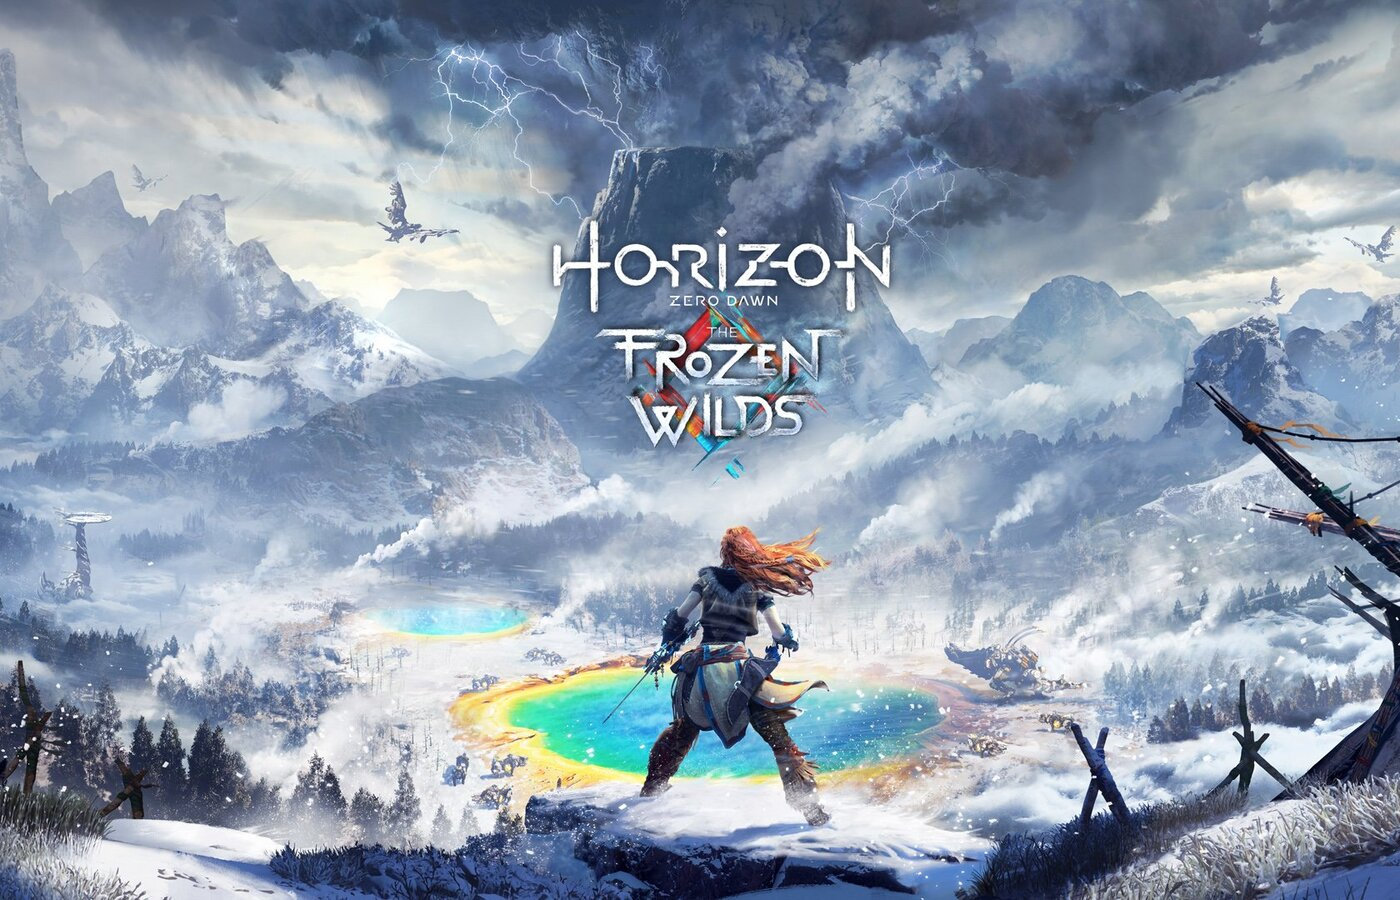 horizon-zero-dawn-the-frozen-wilds-tb.jpg